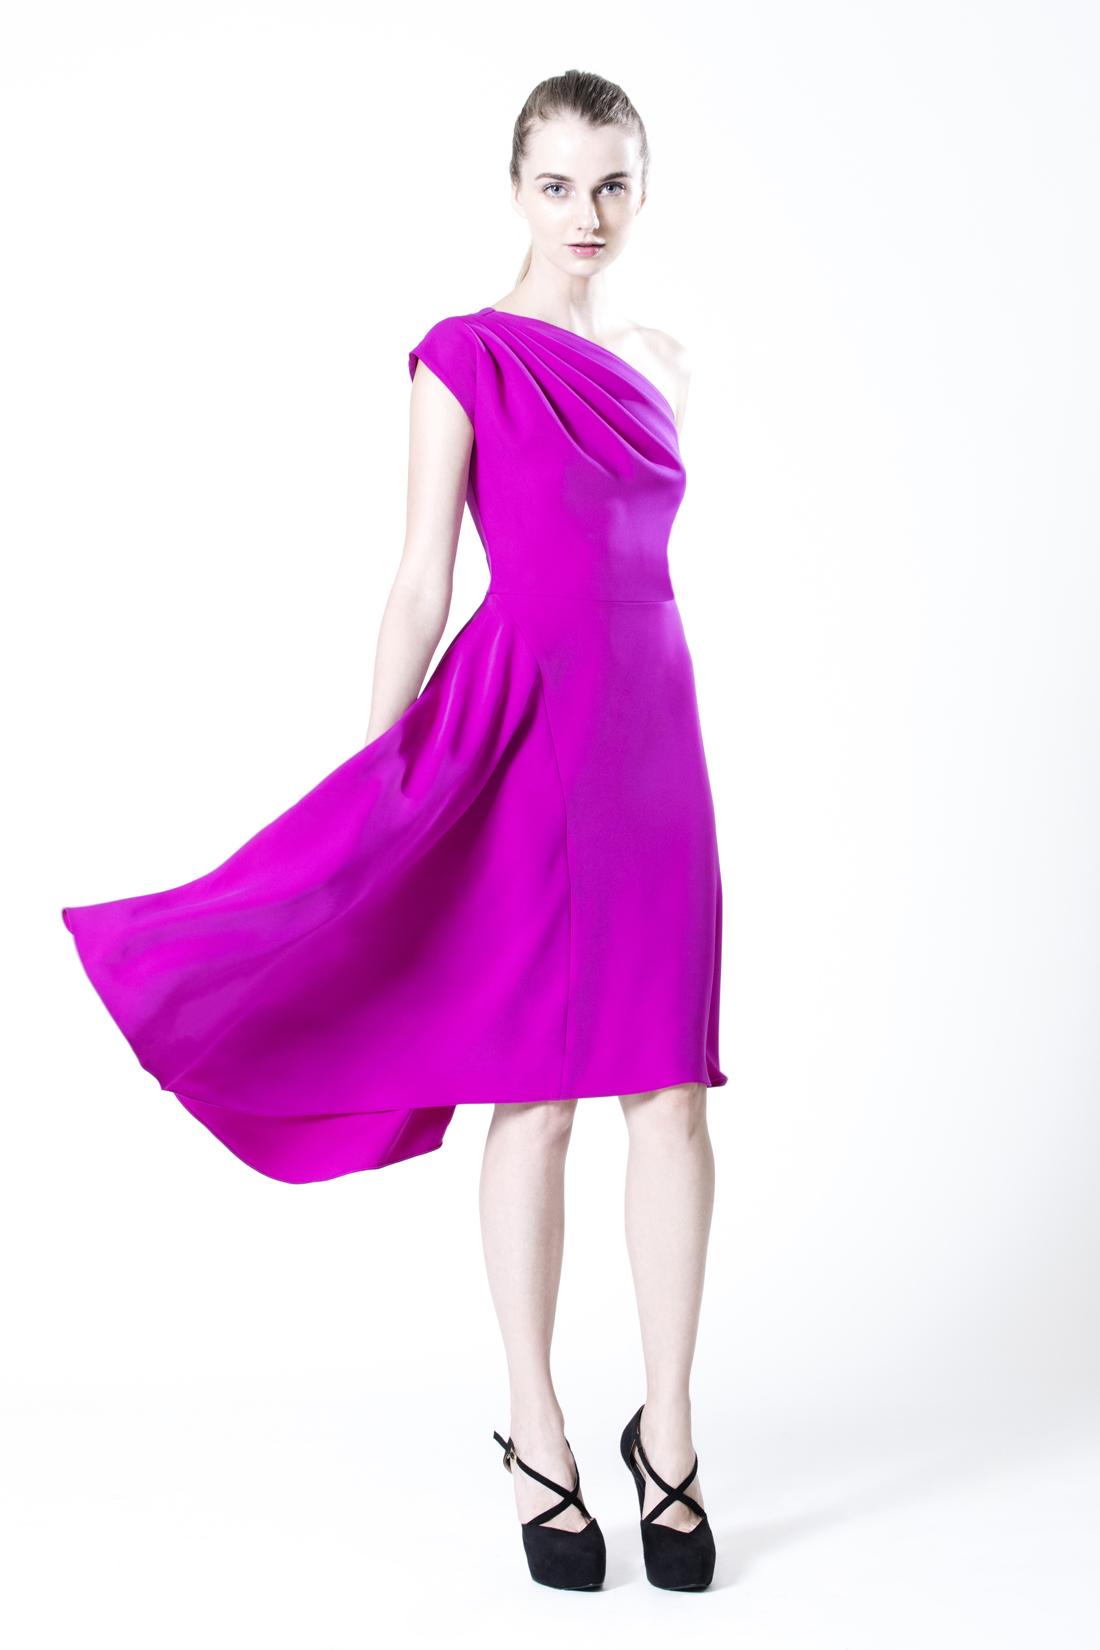 sr-rissa dress.jpg